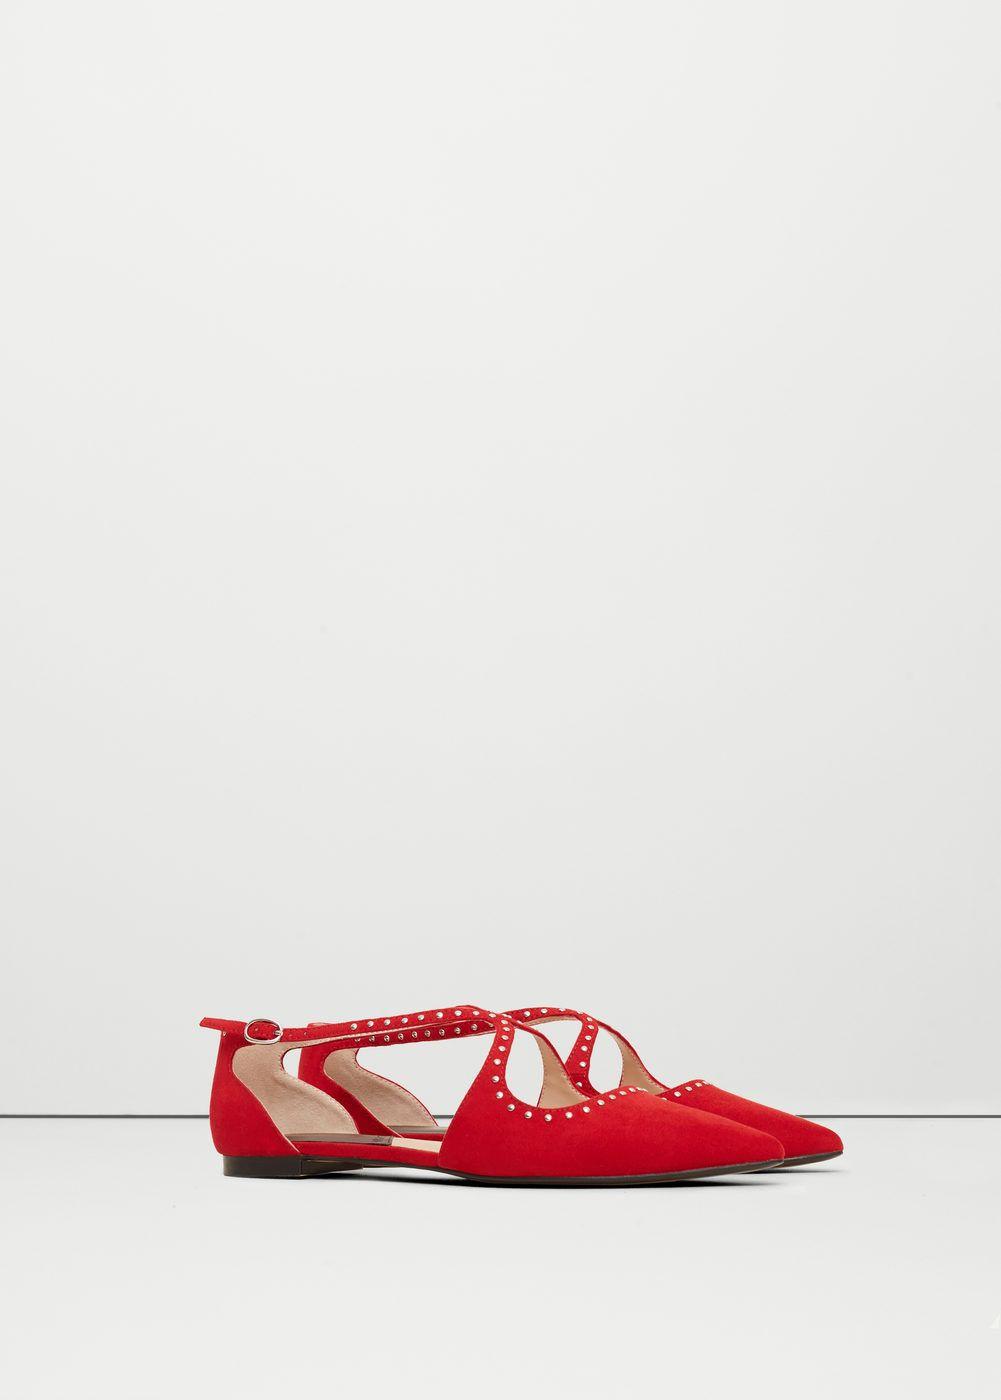 Studded Flat Shoes Women Mango Usa Pointed Toe Flats Studded Flats Shoes Flats